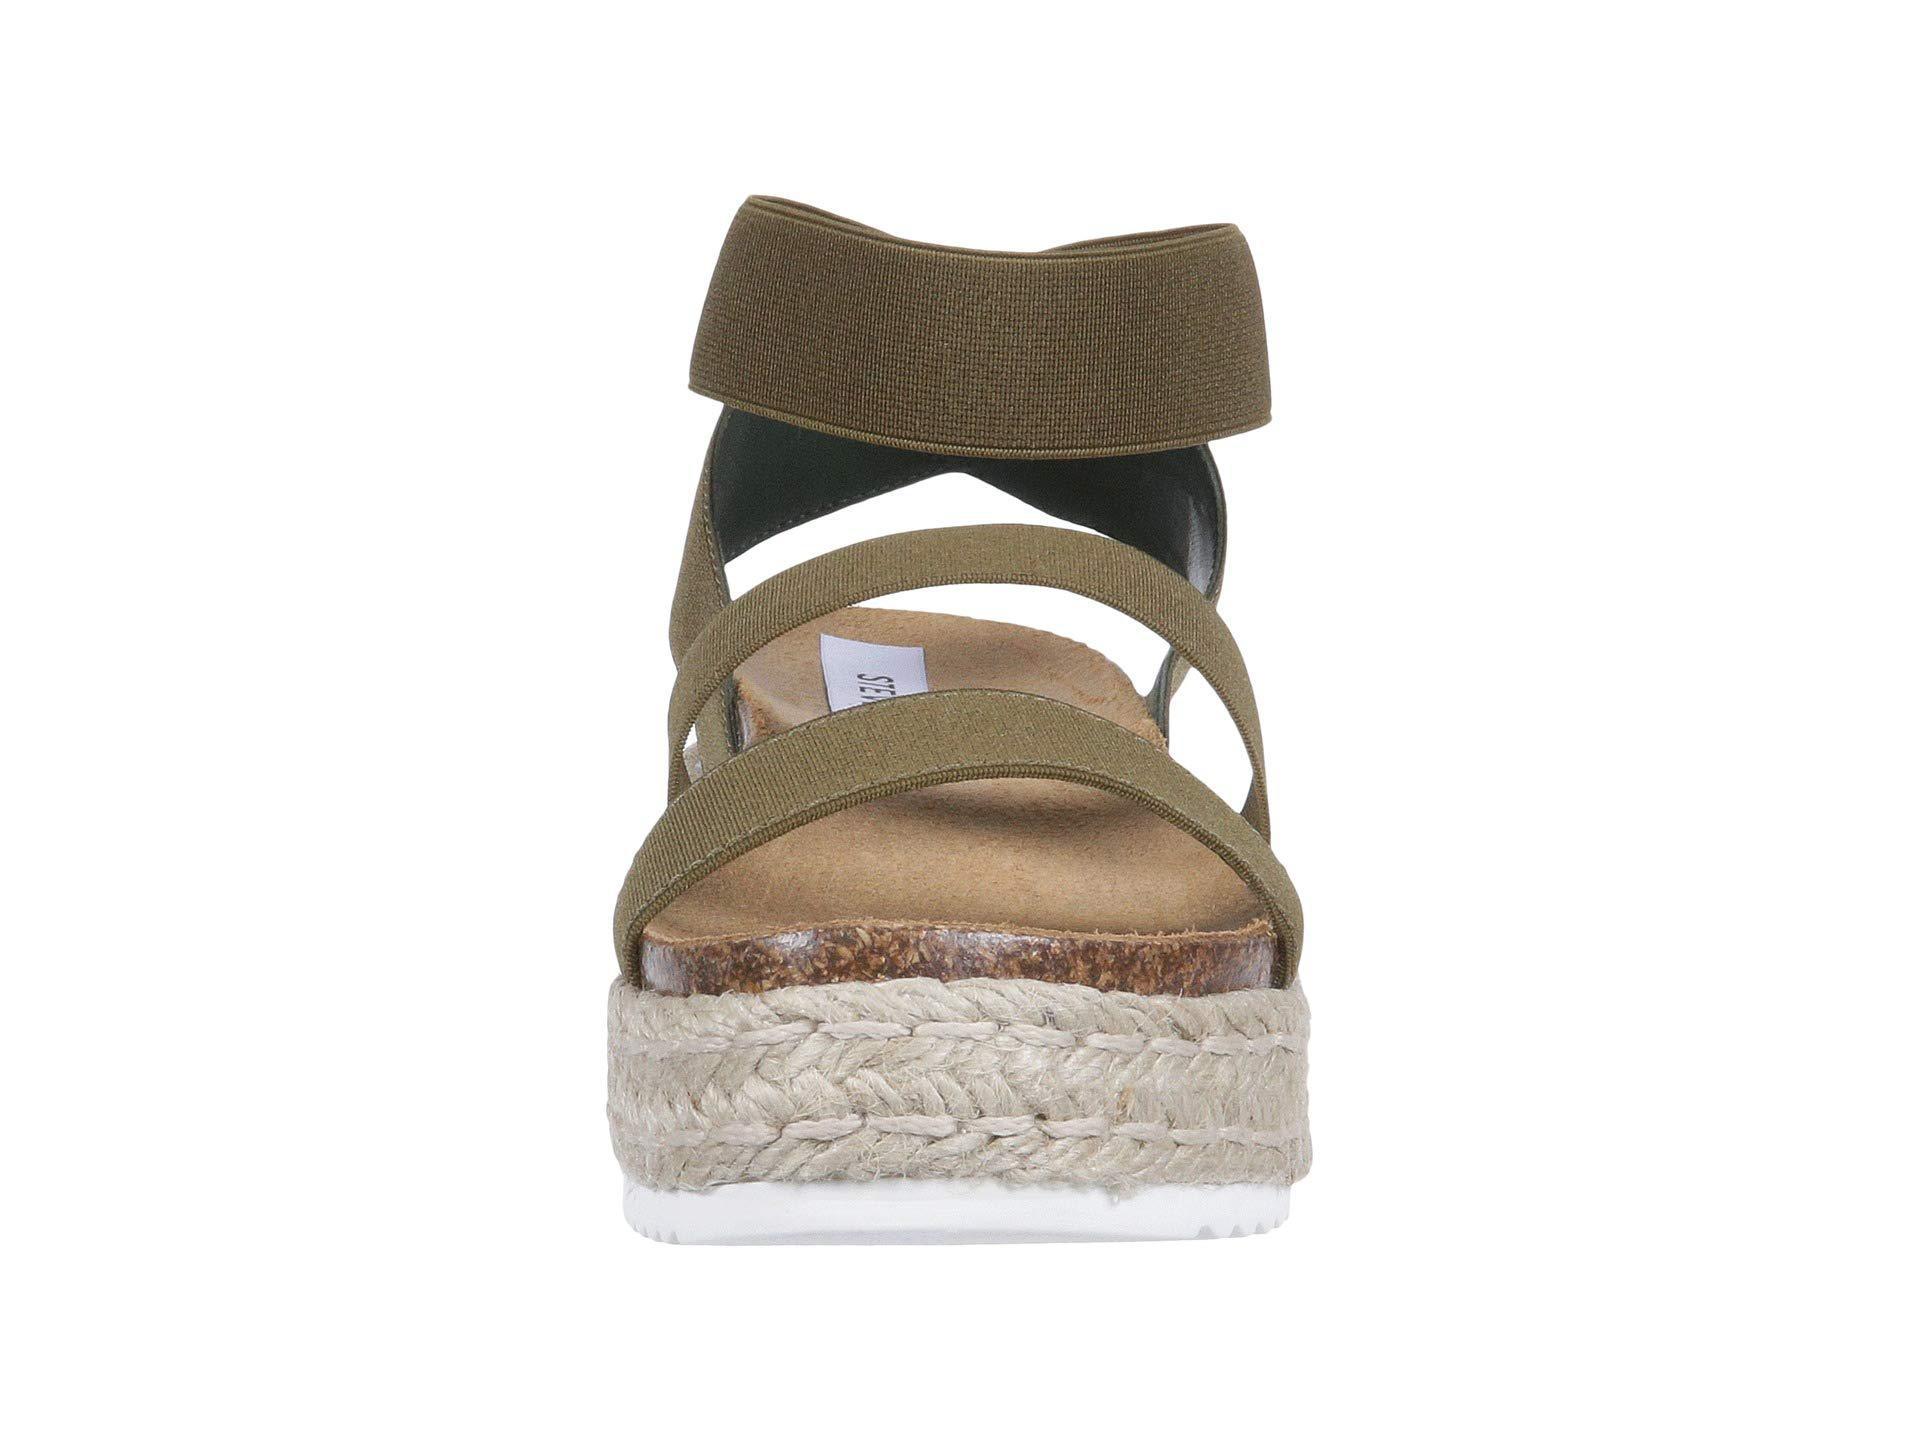 771ce0c8088 Kimmie Espadrille Sandal (black) Women s Shoes - Lyst. View fullscreen. Steve  Madden Kimmie Espadrille ...